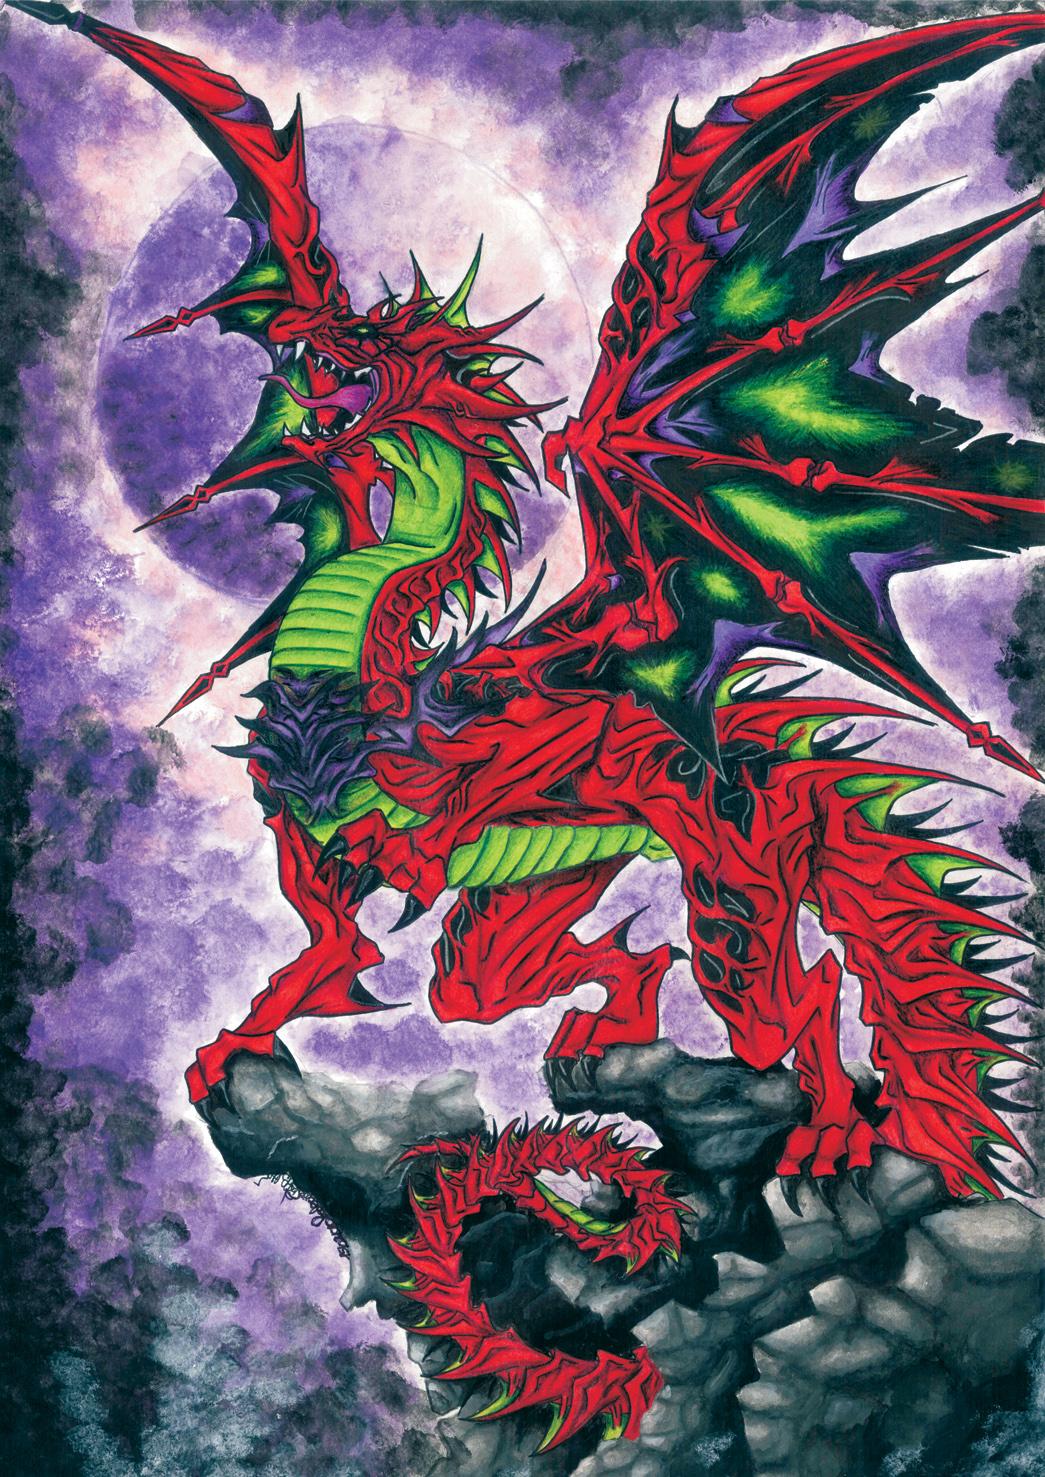 Moon's dragon